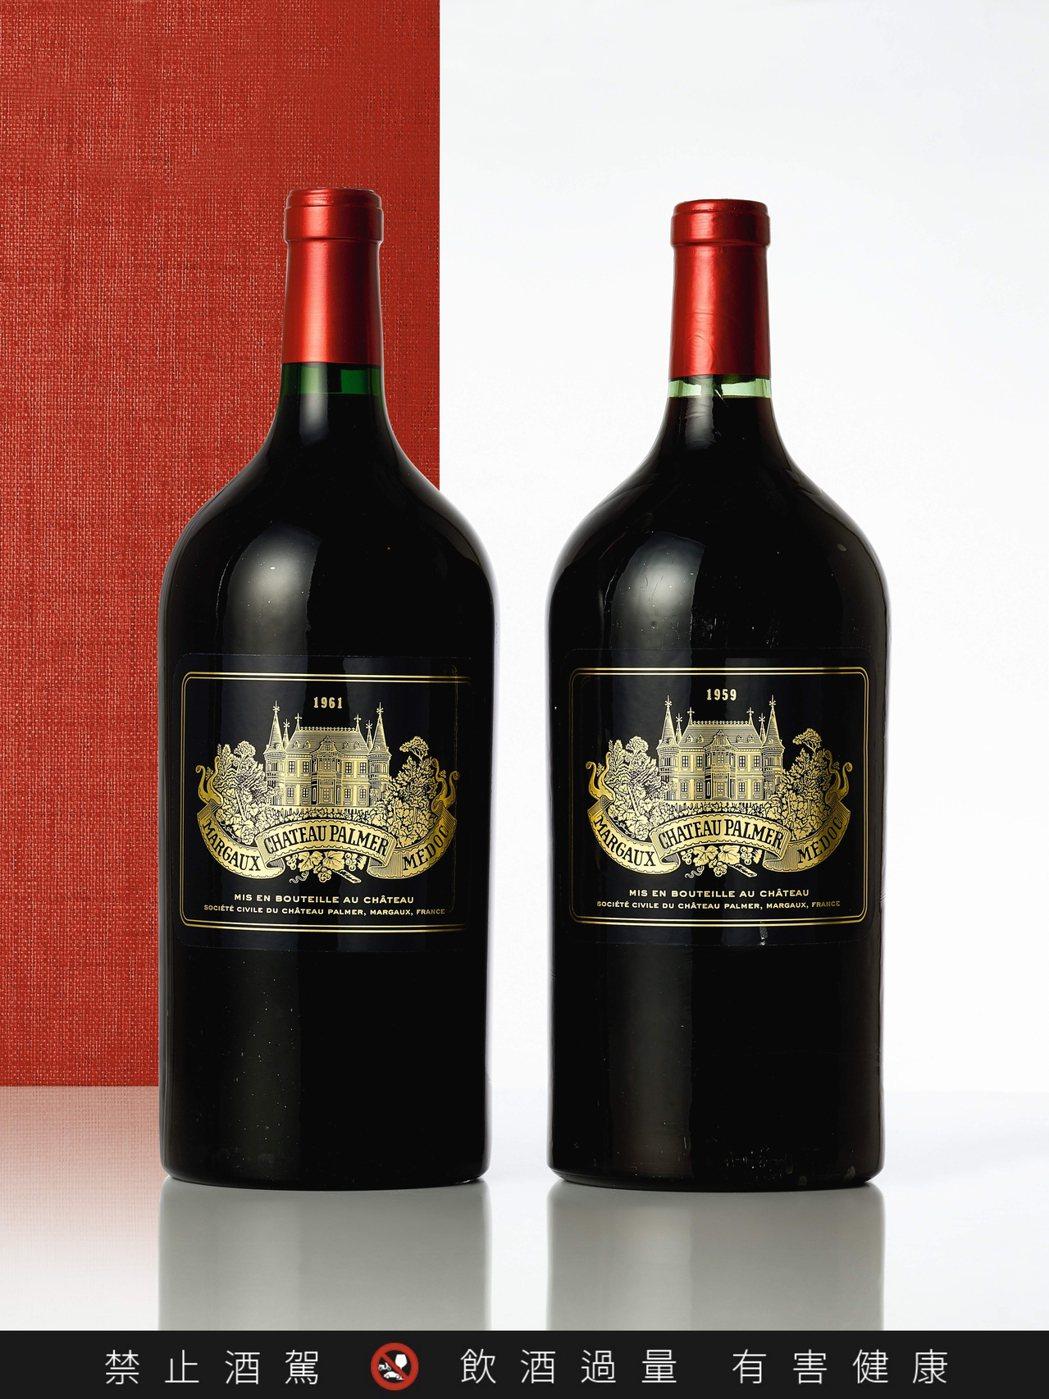 Palmer 1961年(3公升裝單瓶)估價20萬港元起。圖/蘇富比提供